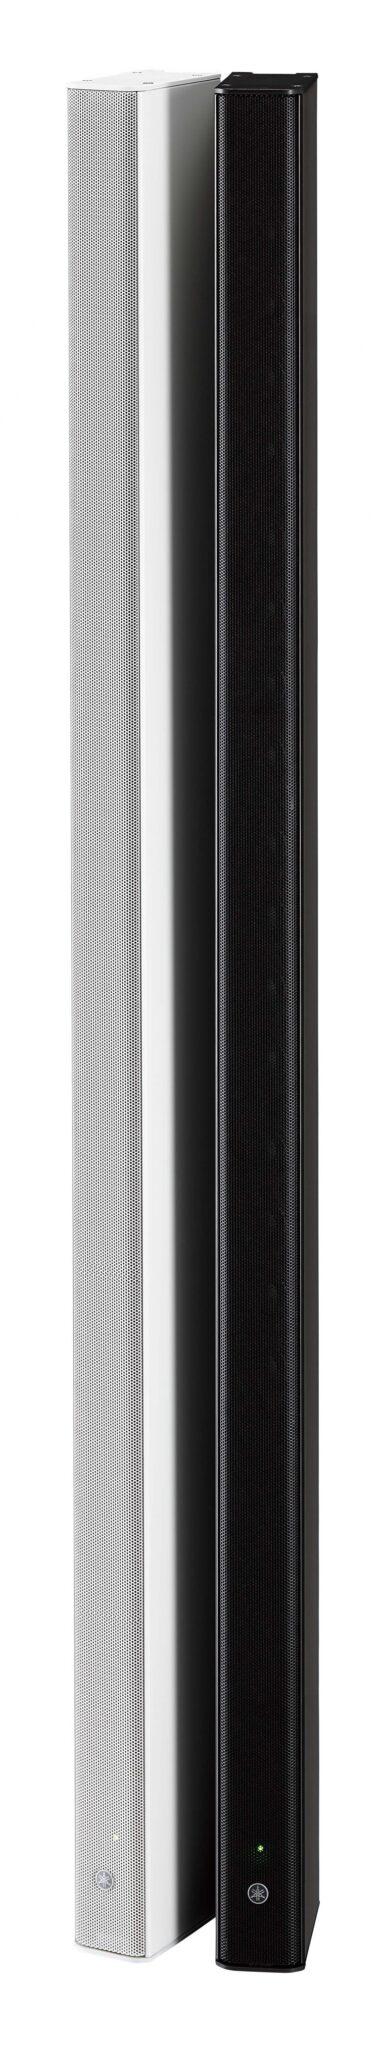 New Yamaha VXL1-16P Speaker, SWR2311P-10G Intelligent L2 Switch Make InfoComm 2018 Debut